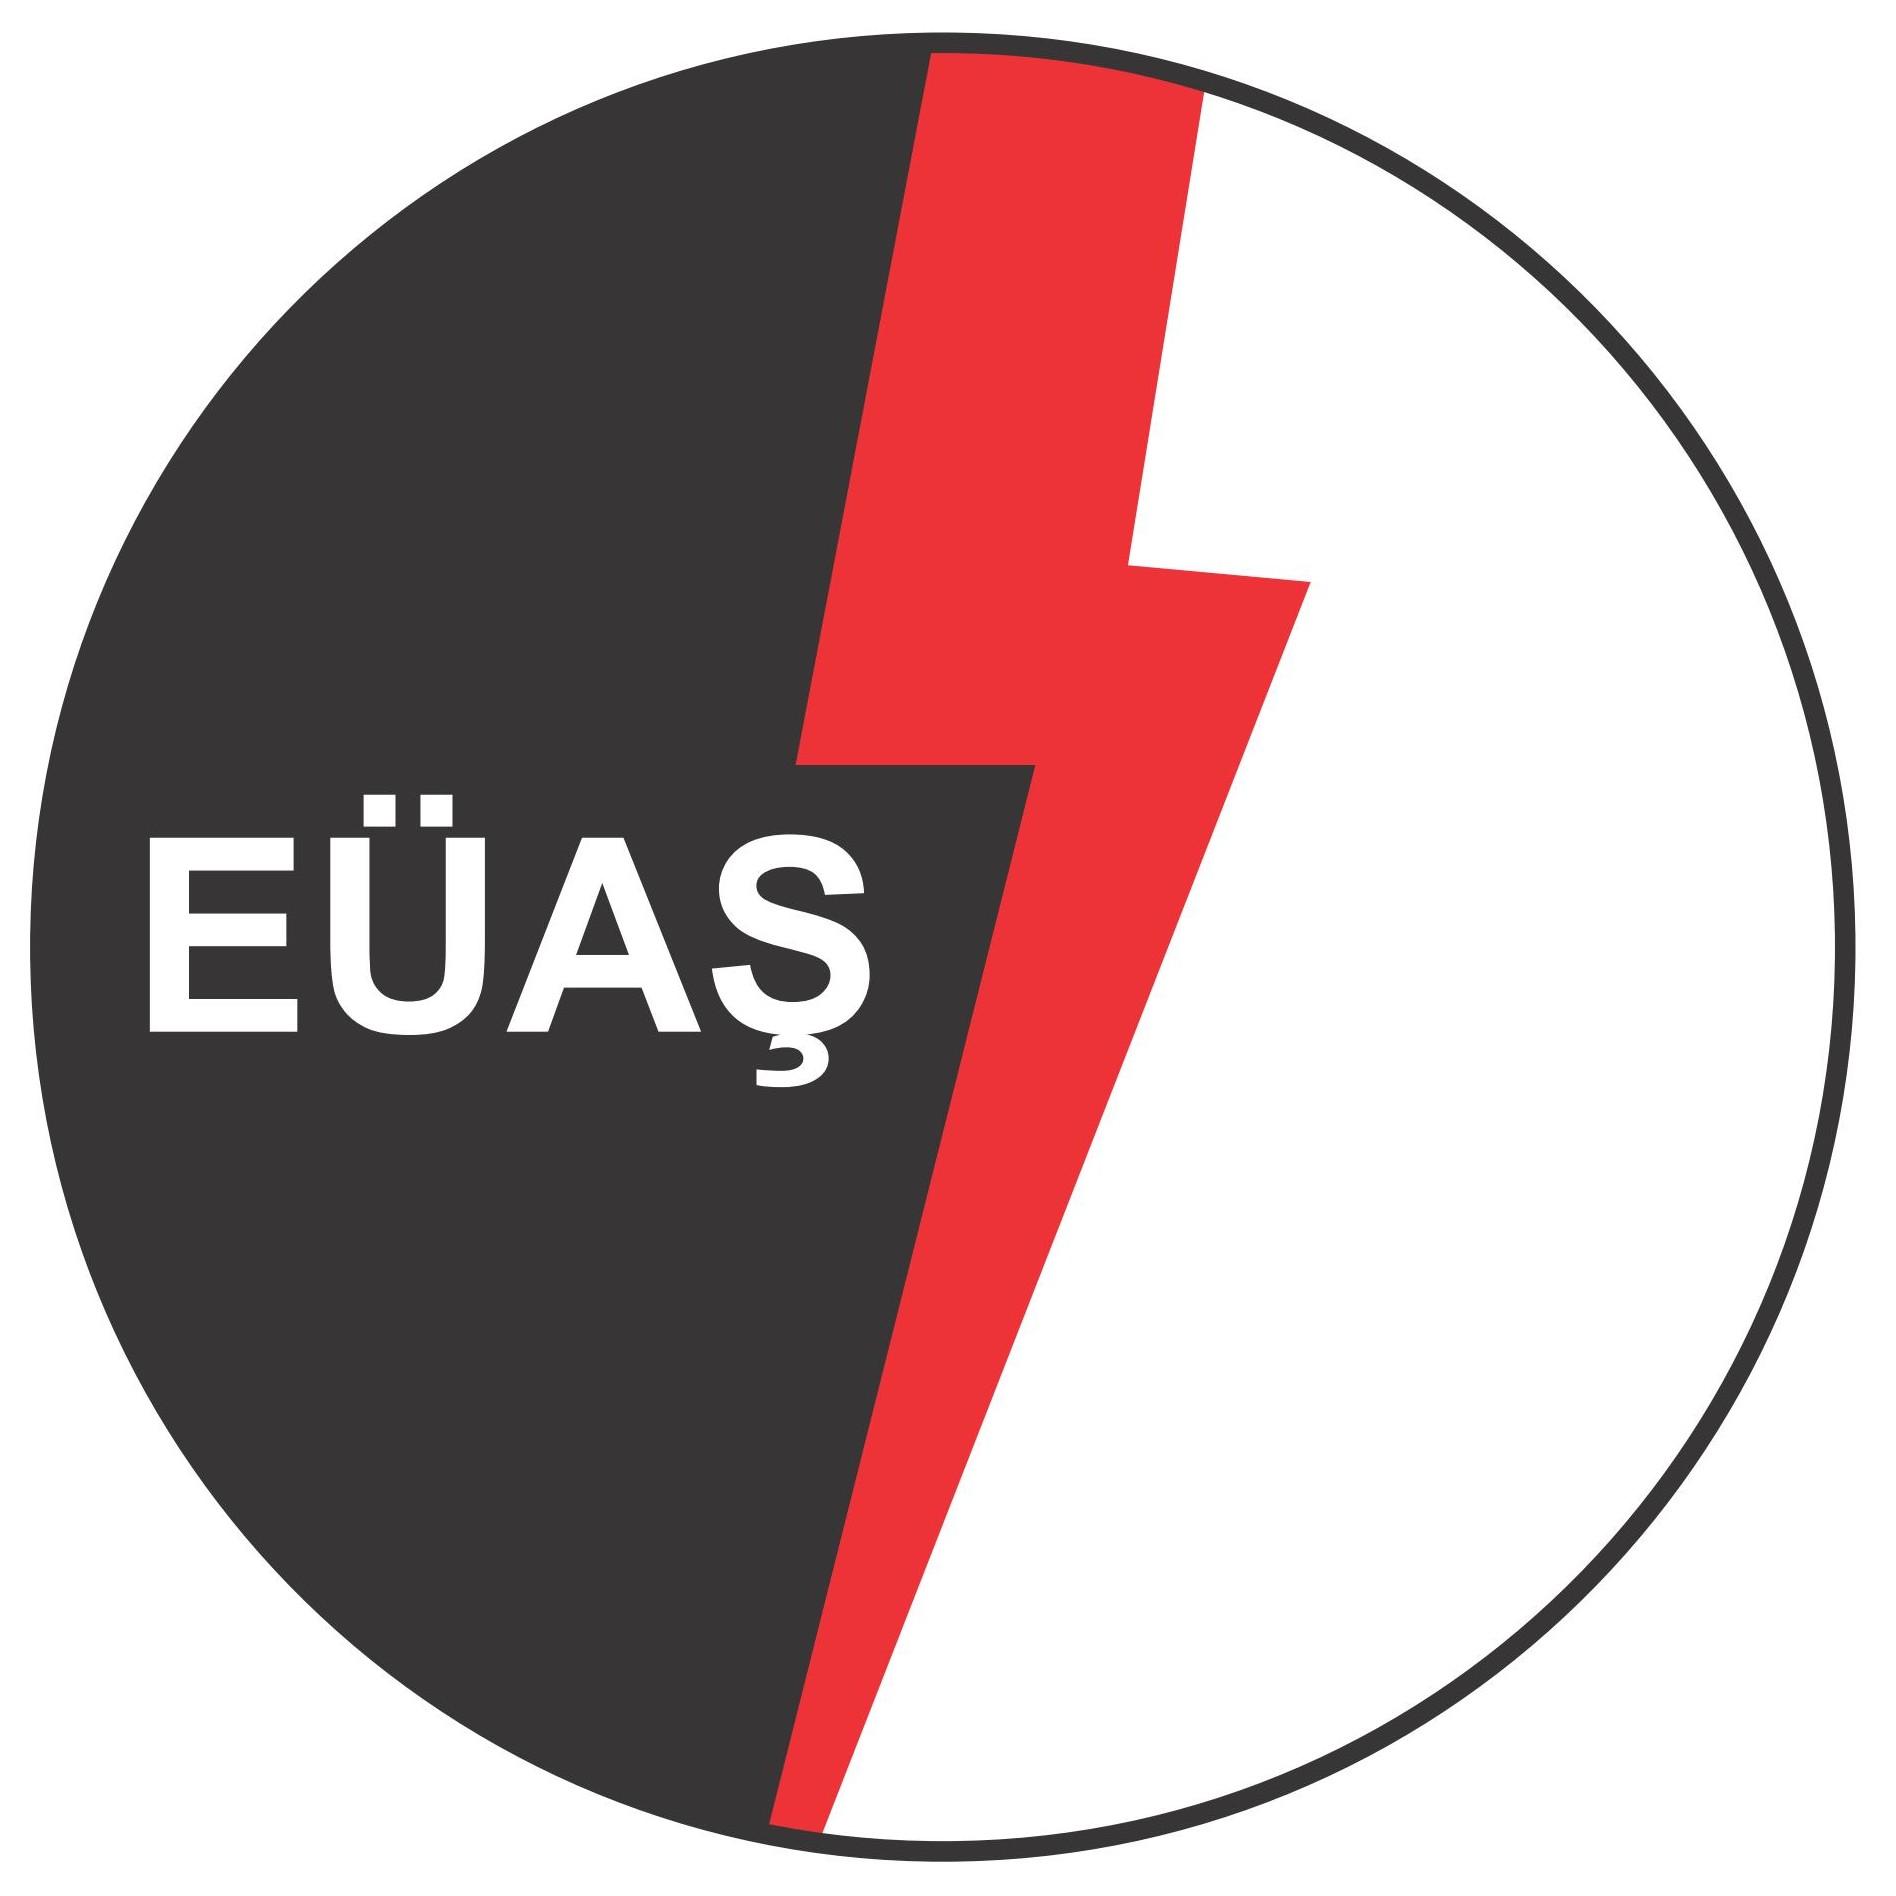 elektrik-uretim-as-euas-logo.jpg